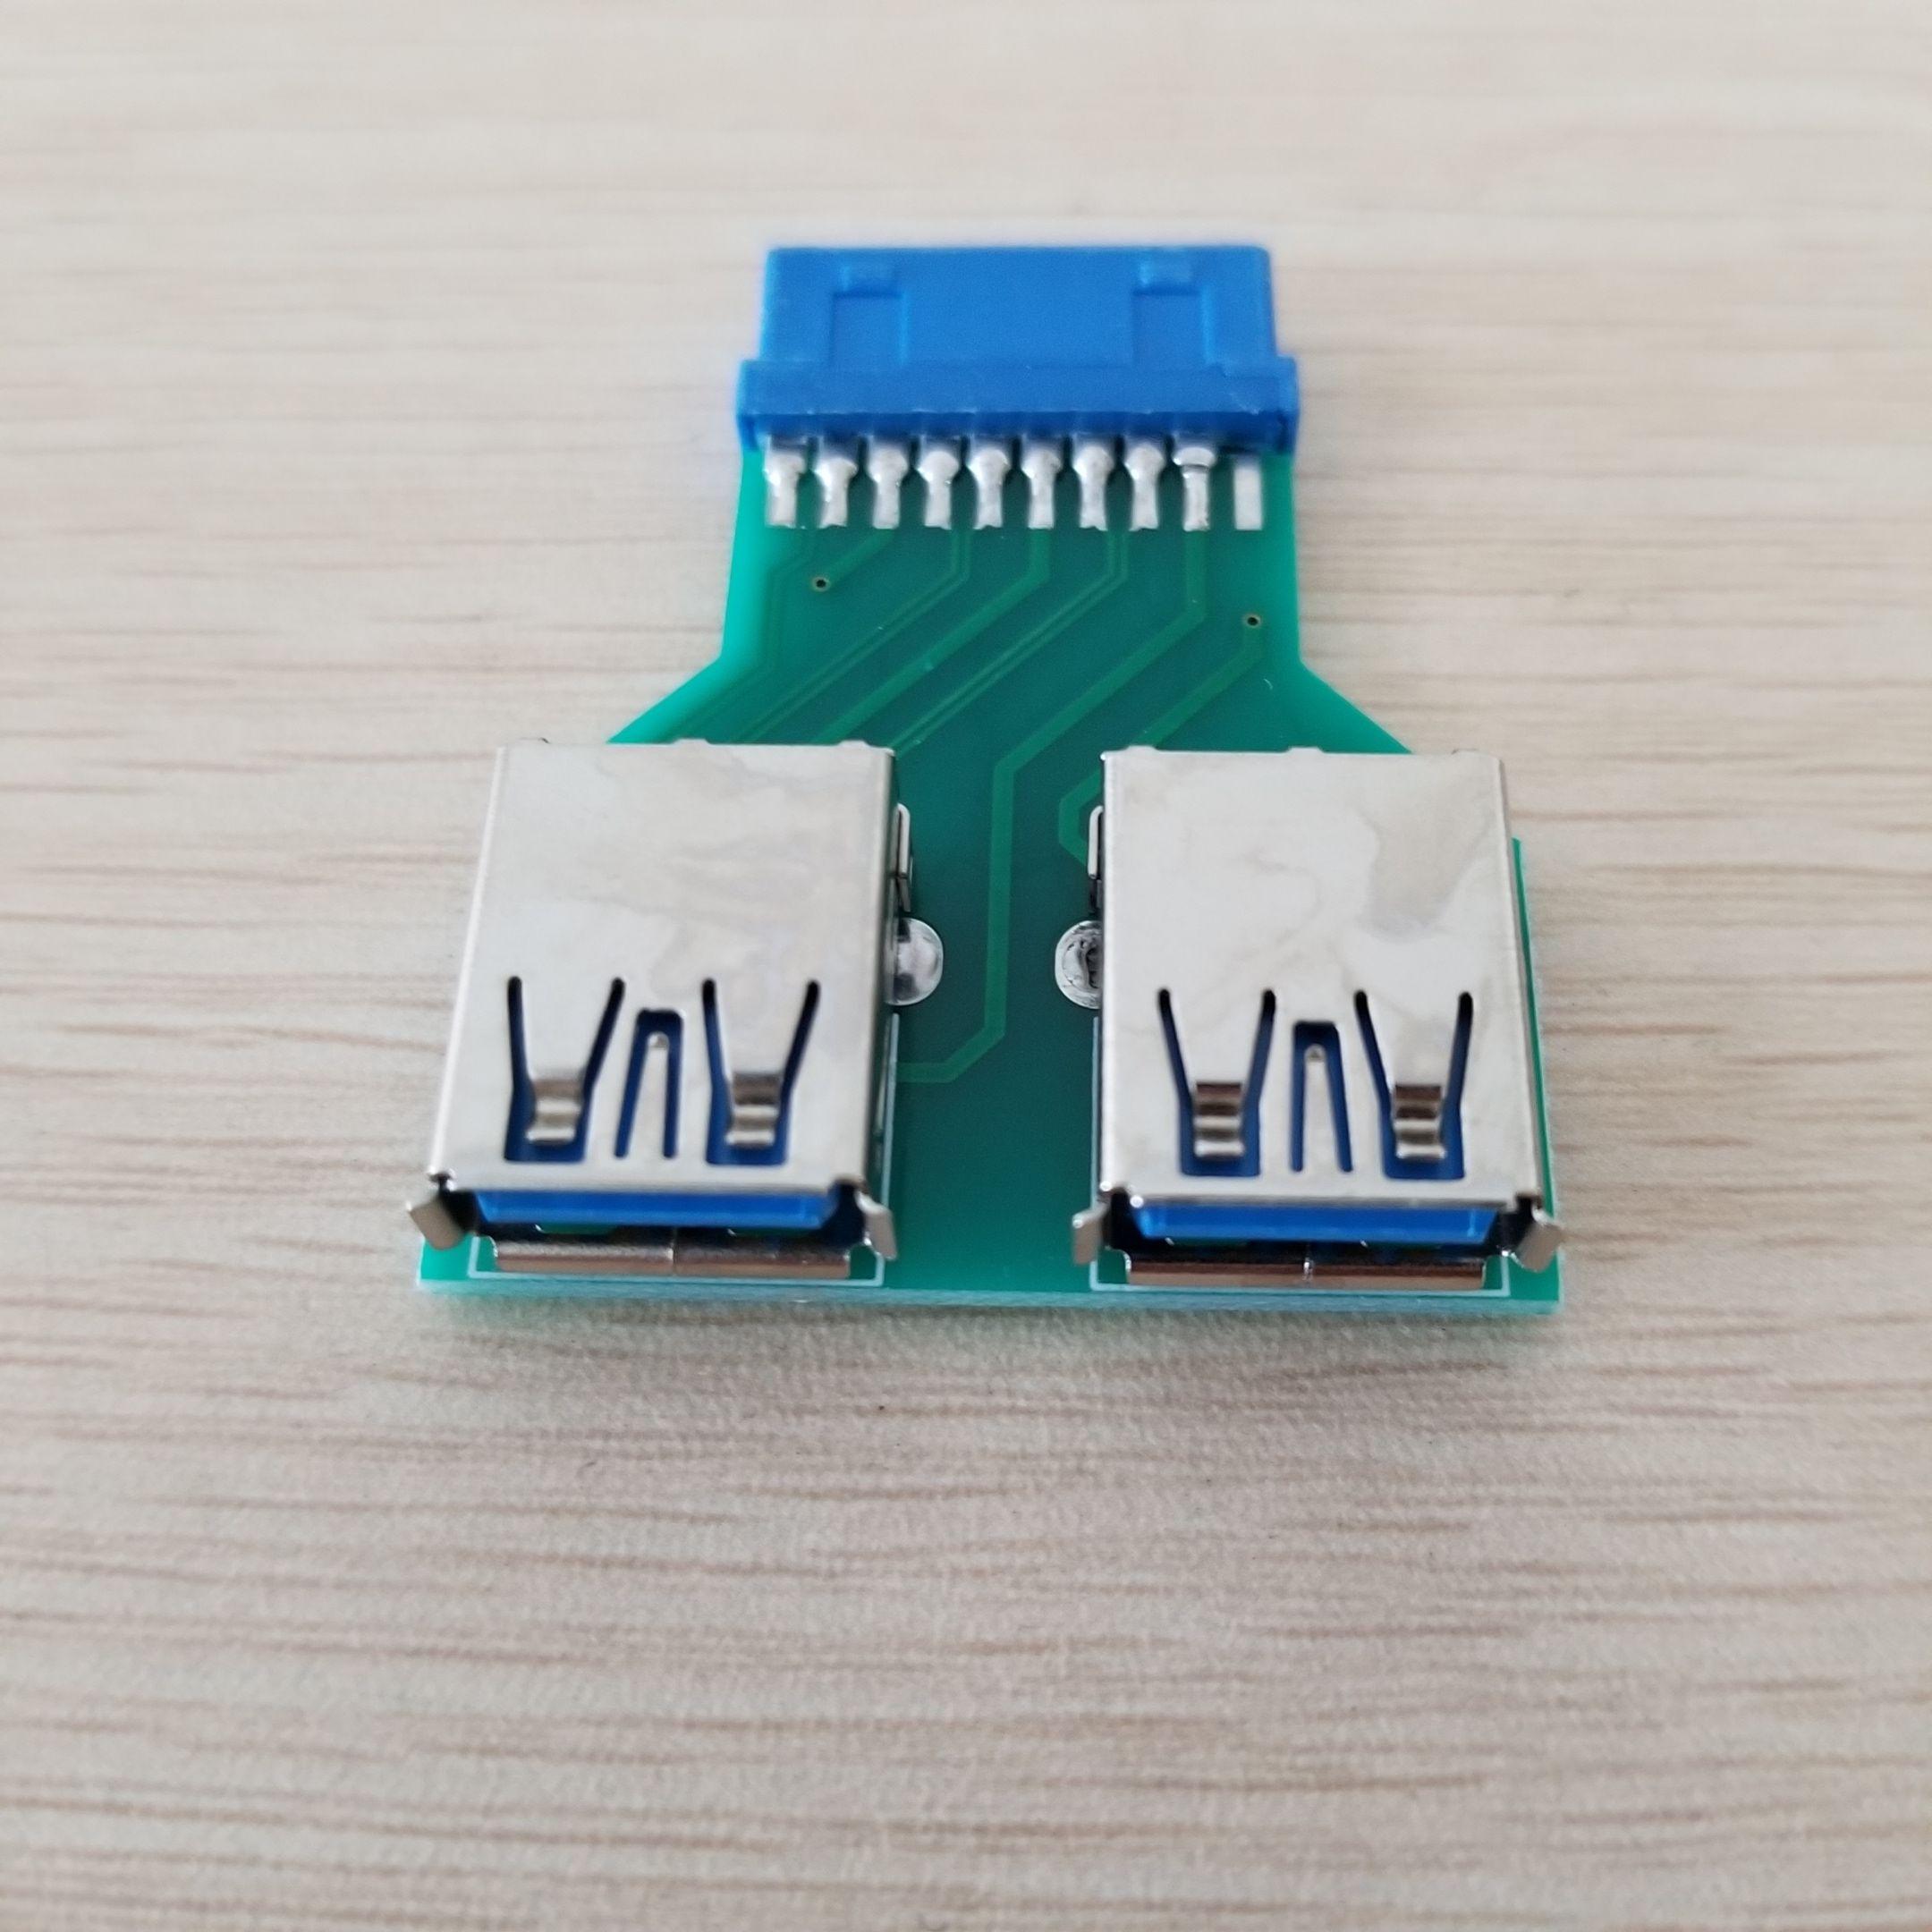 Mini Płyta główna 20PIN Header do 2 Port 3,0 Hub A Adapter Connector Samica do kobiet do Extender USB PCB